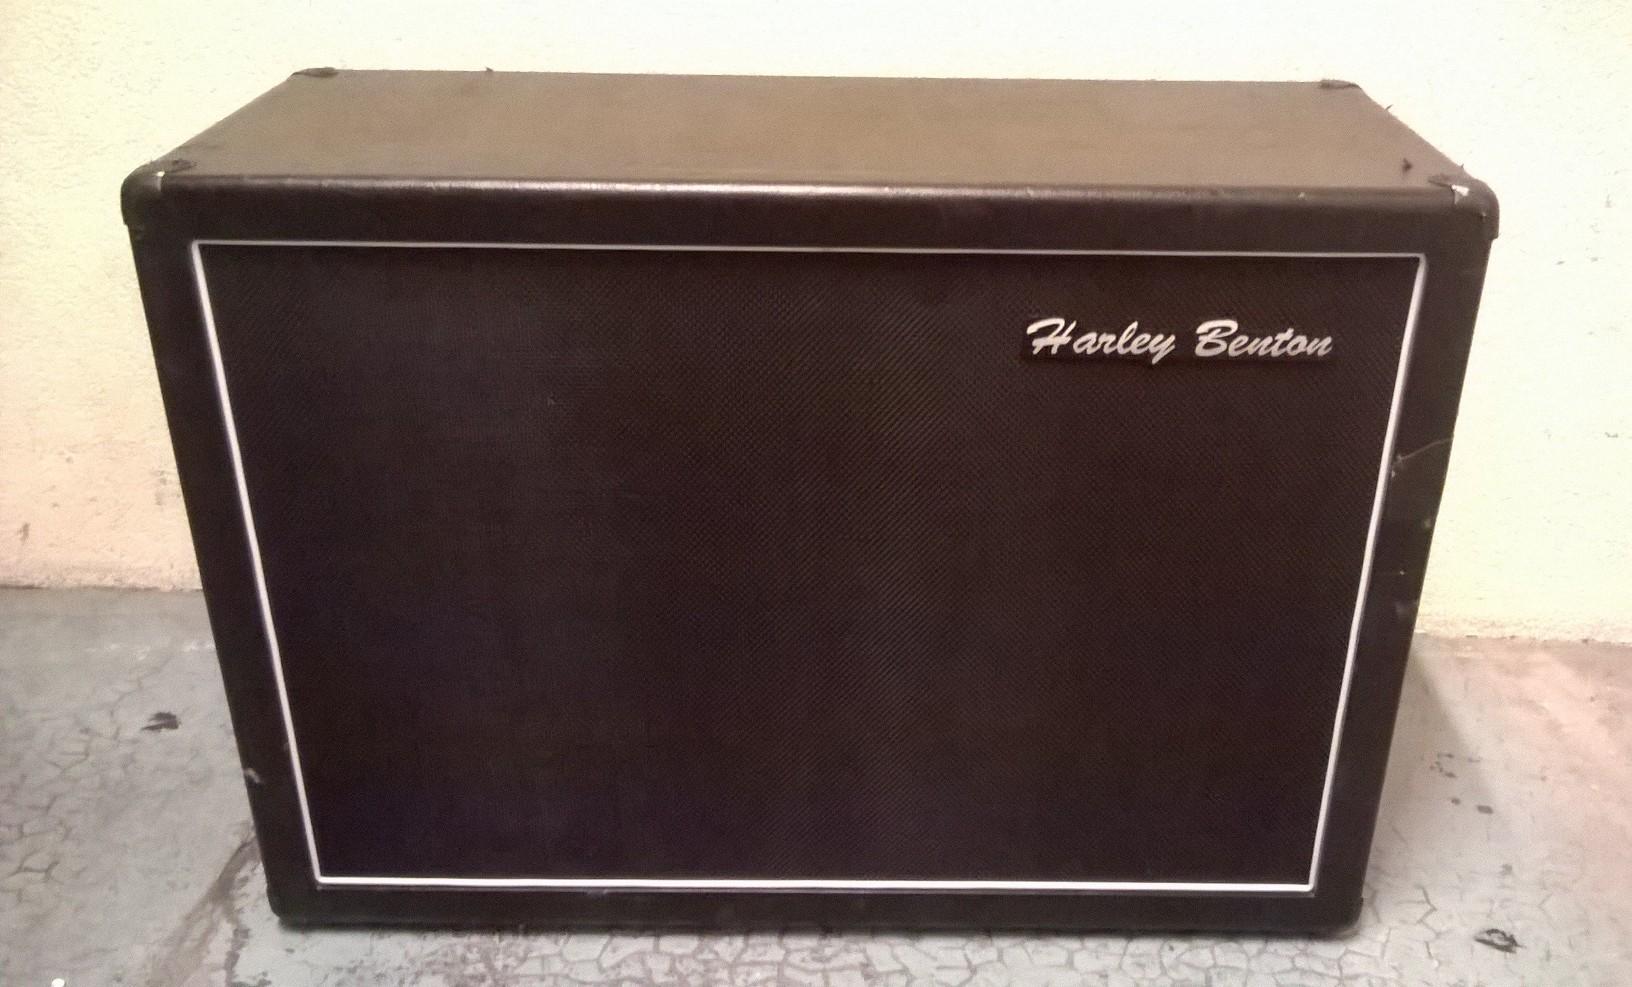 photo harley benton g212 vintage cabinet harley benton 1 1460906 audiofanzine. Black Bedroom Furniture Sets. Home Design Ideas